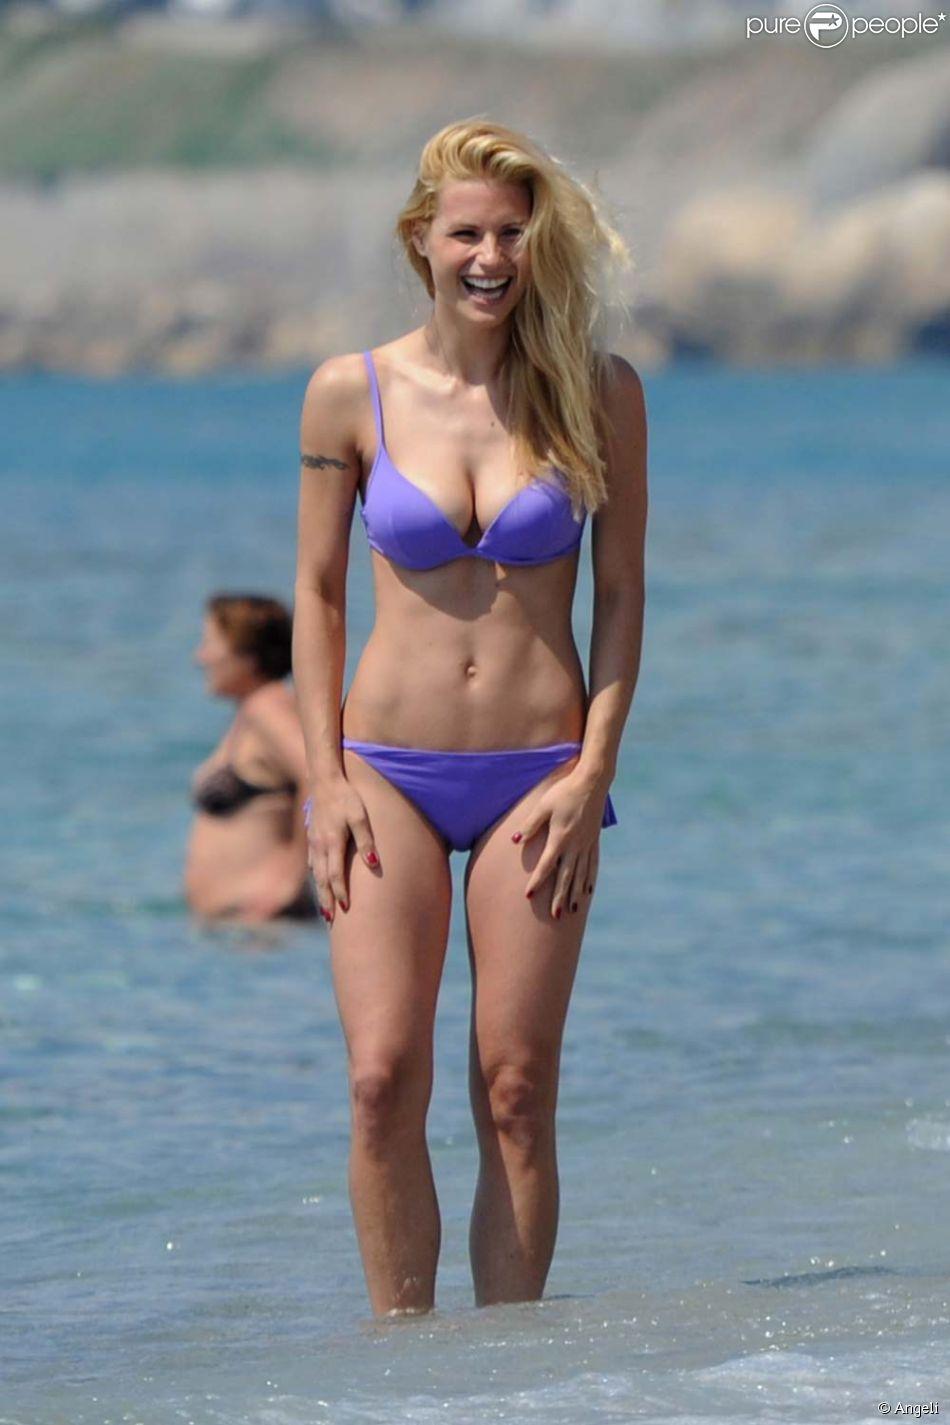 Francesca agostini and alessia navarro nude hope lost - 2 5